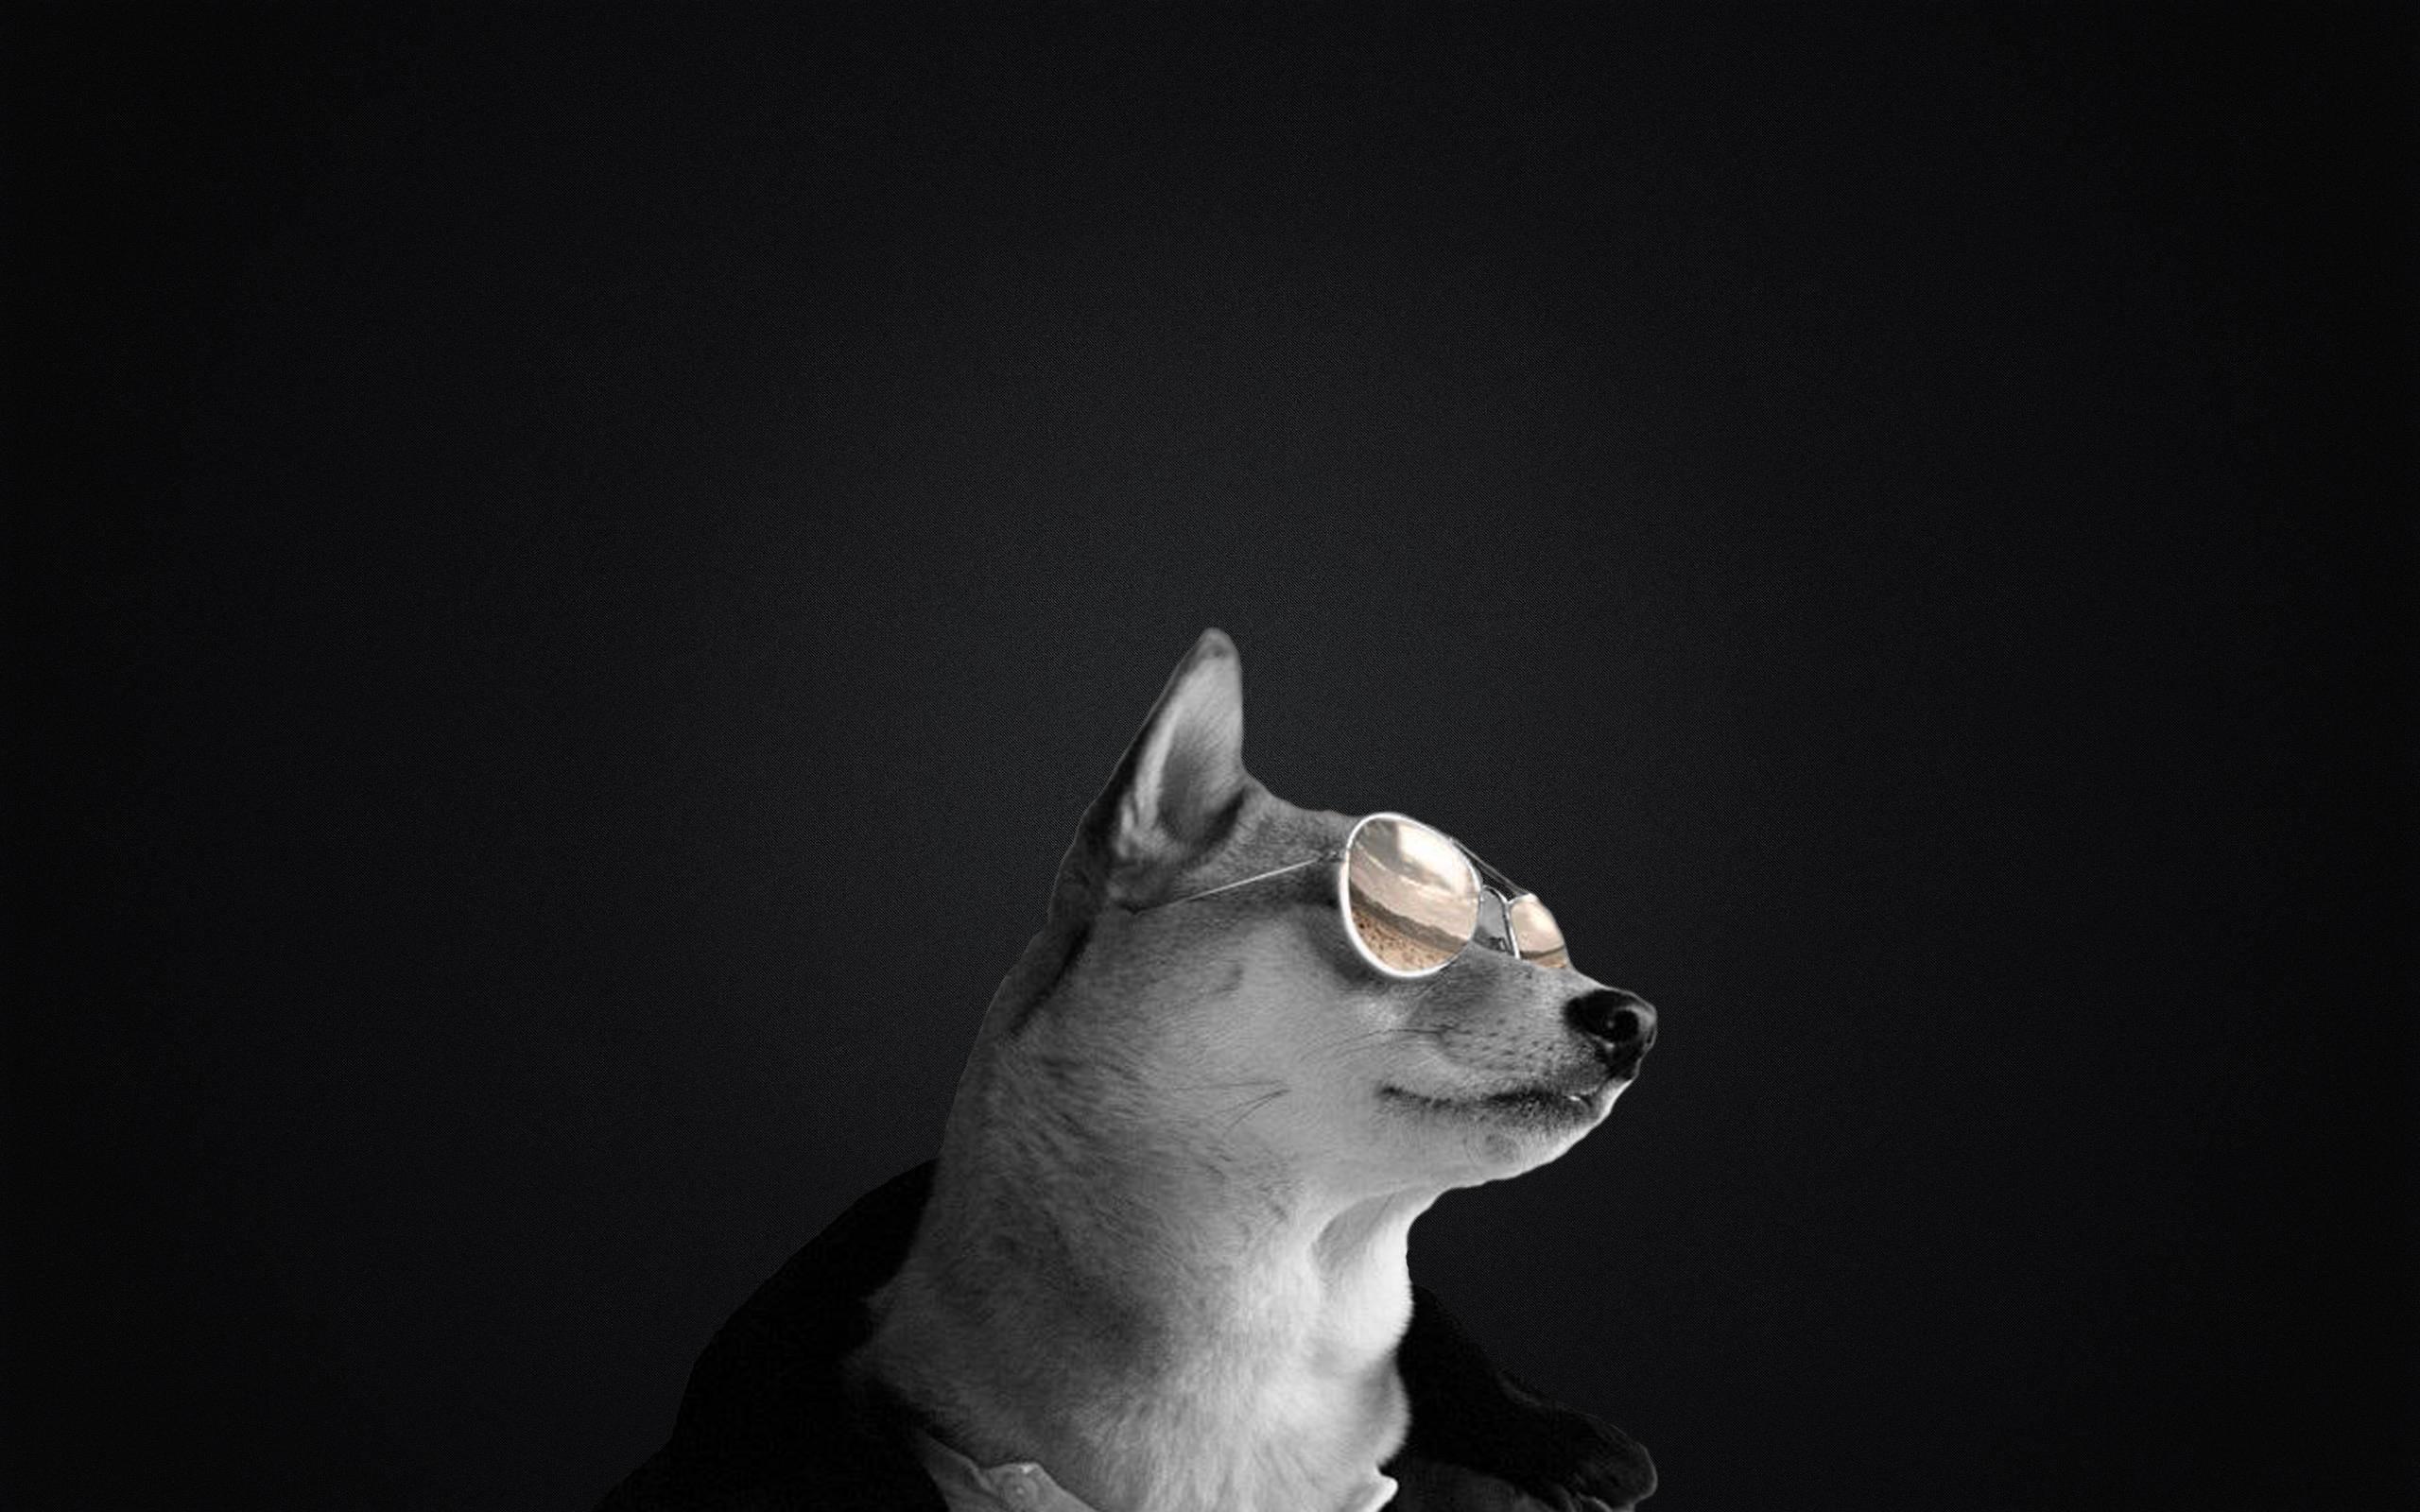 Badass doge with sunglasses wallpaper …